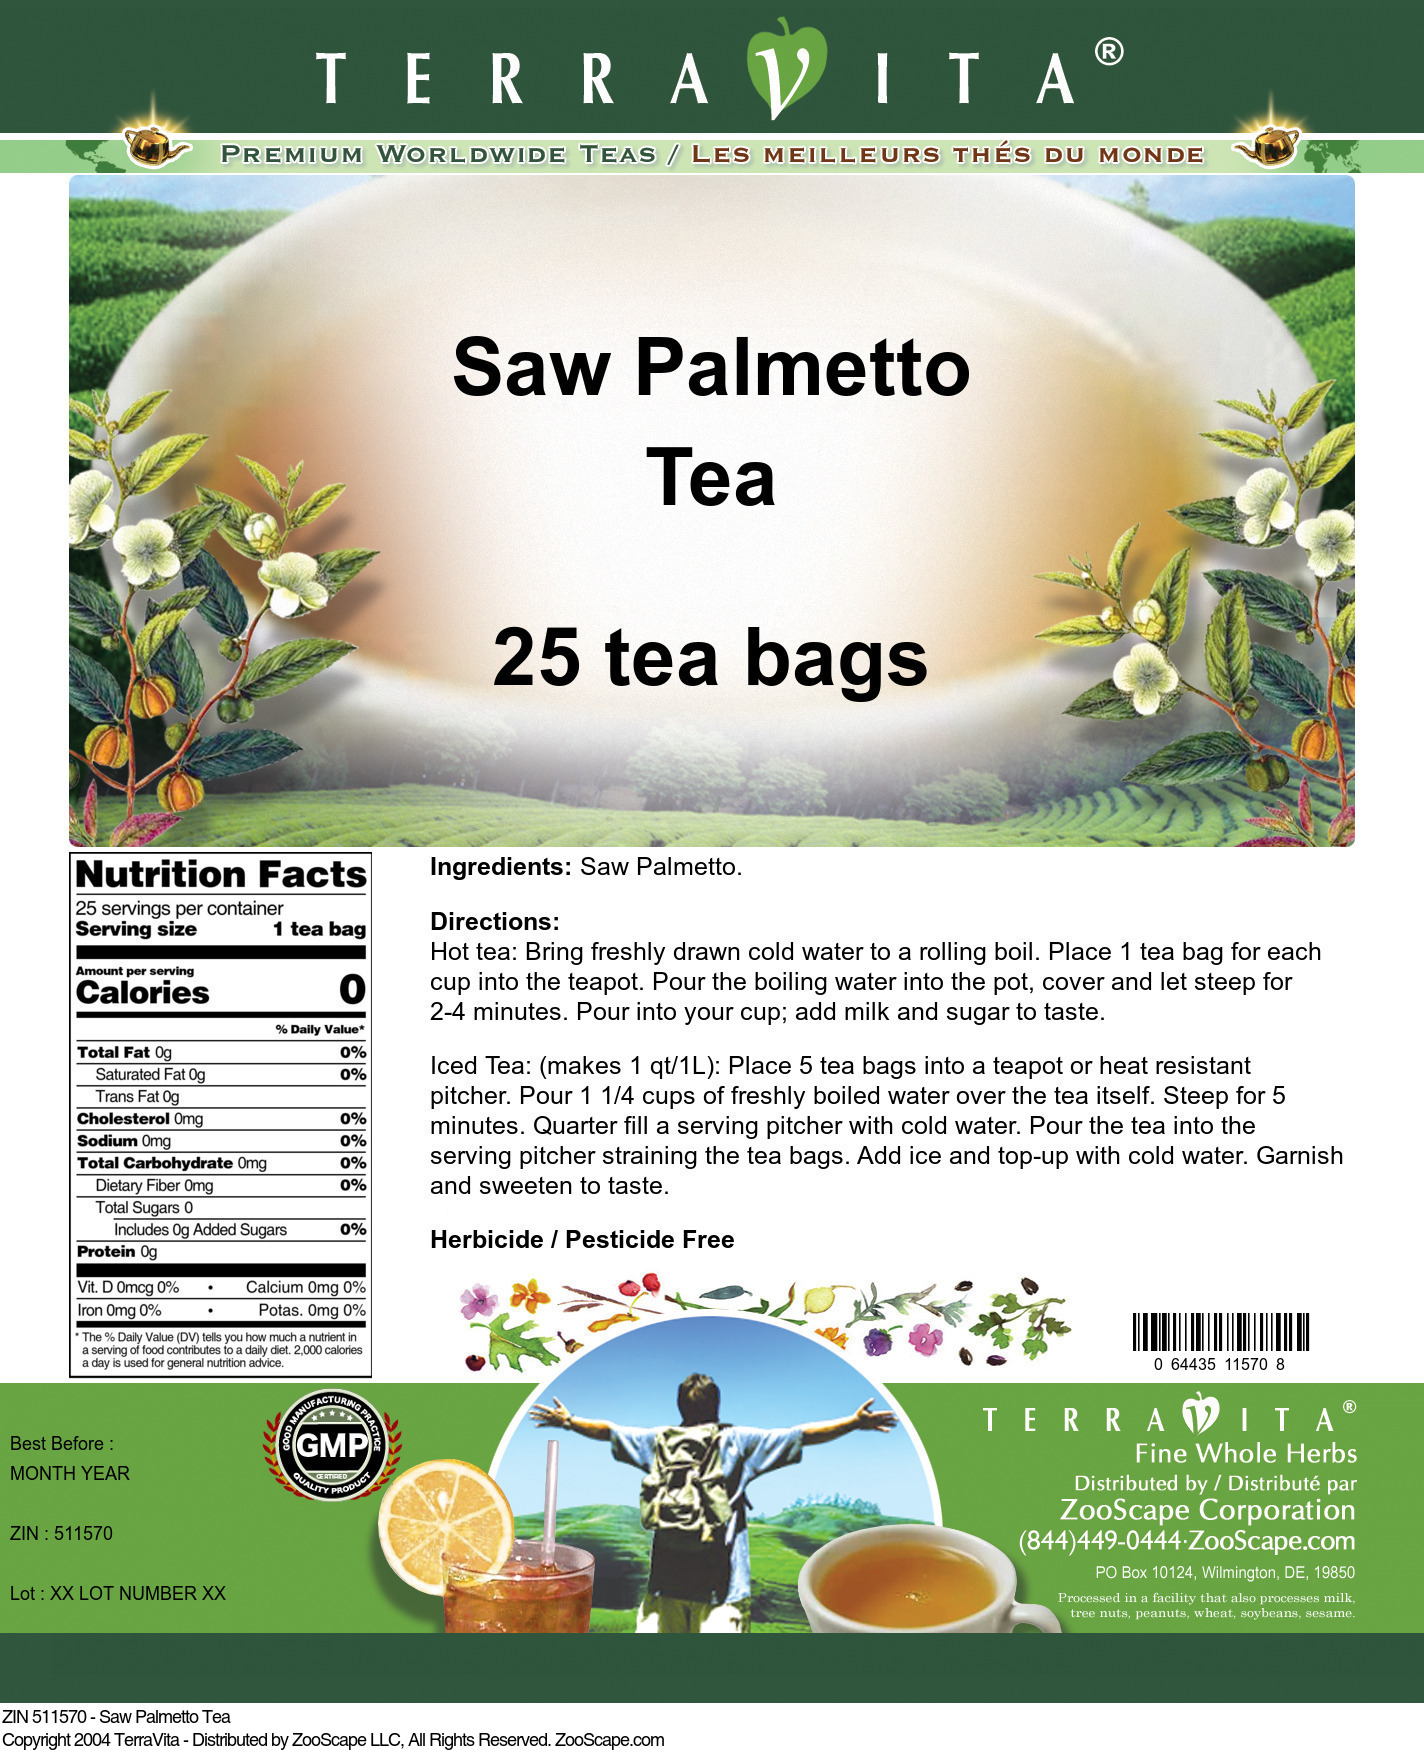 Saw Palmetto Tea